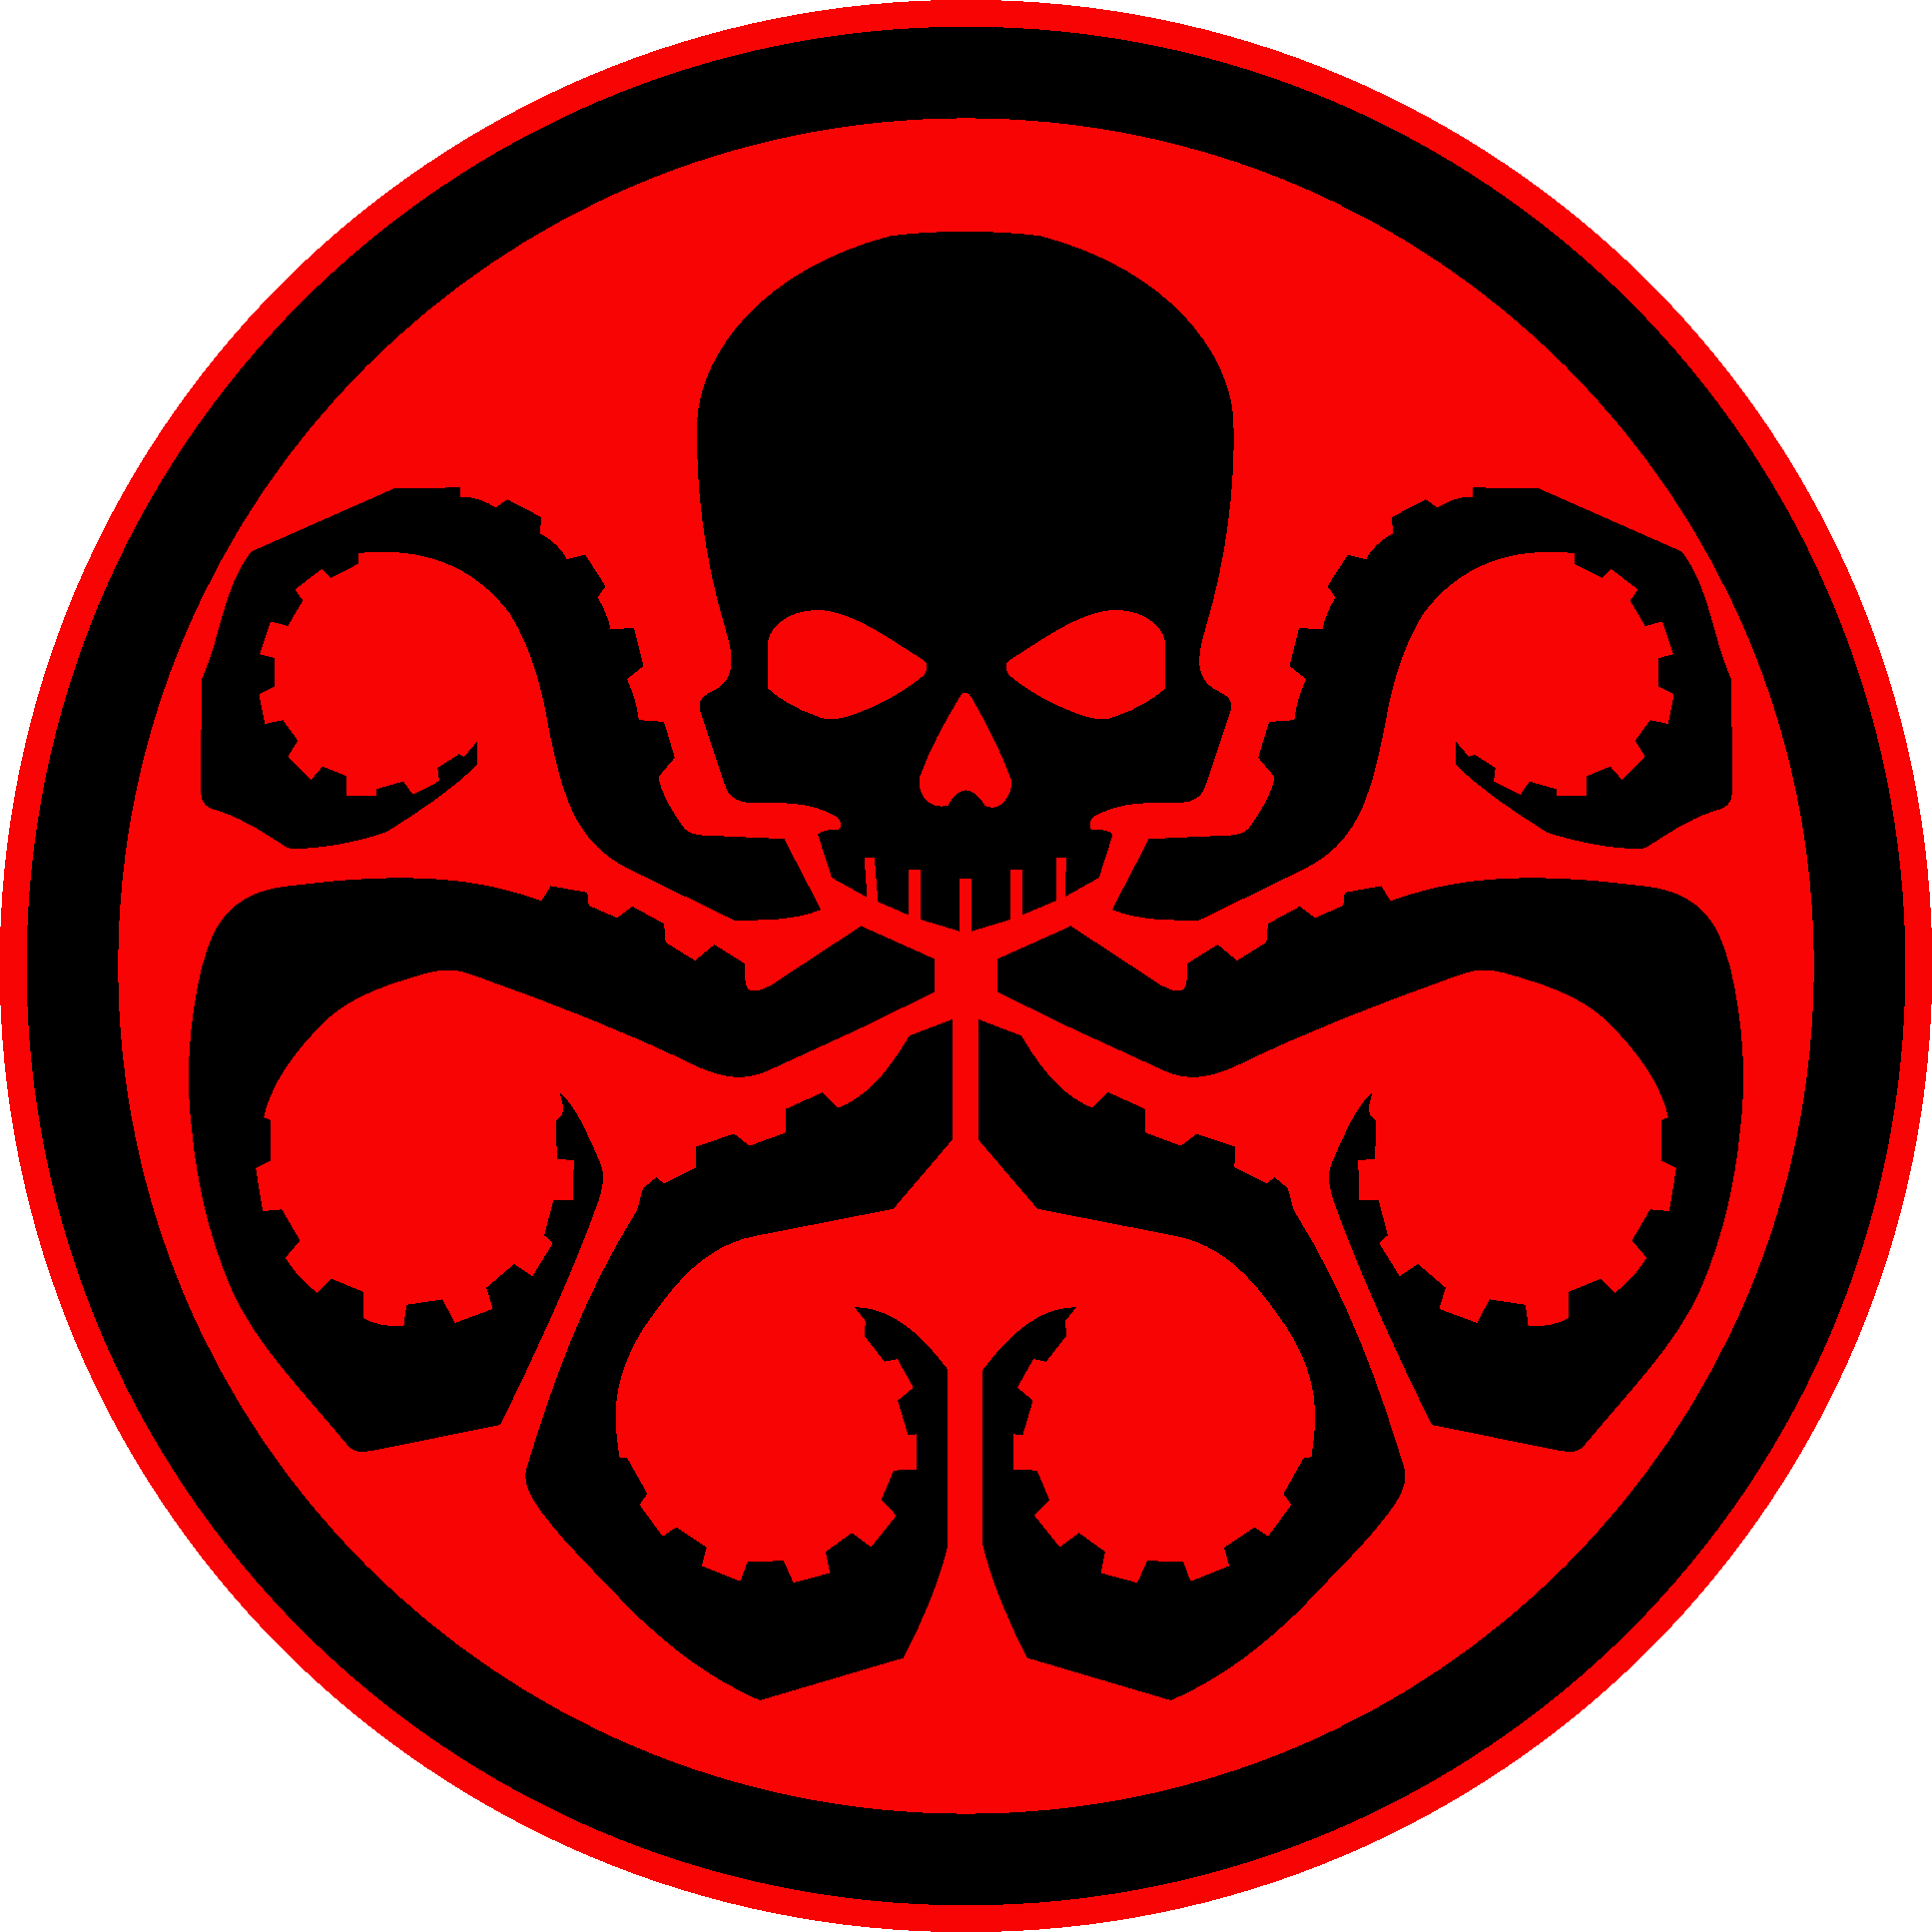 Hydra (Marvel Cinematic Universe)